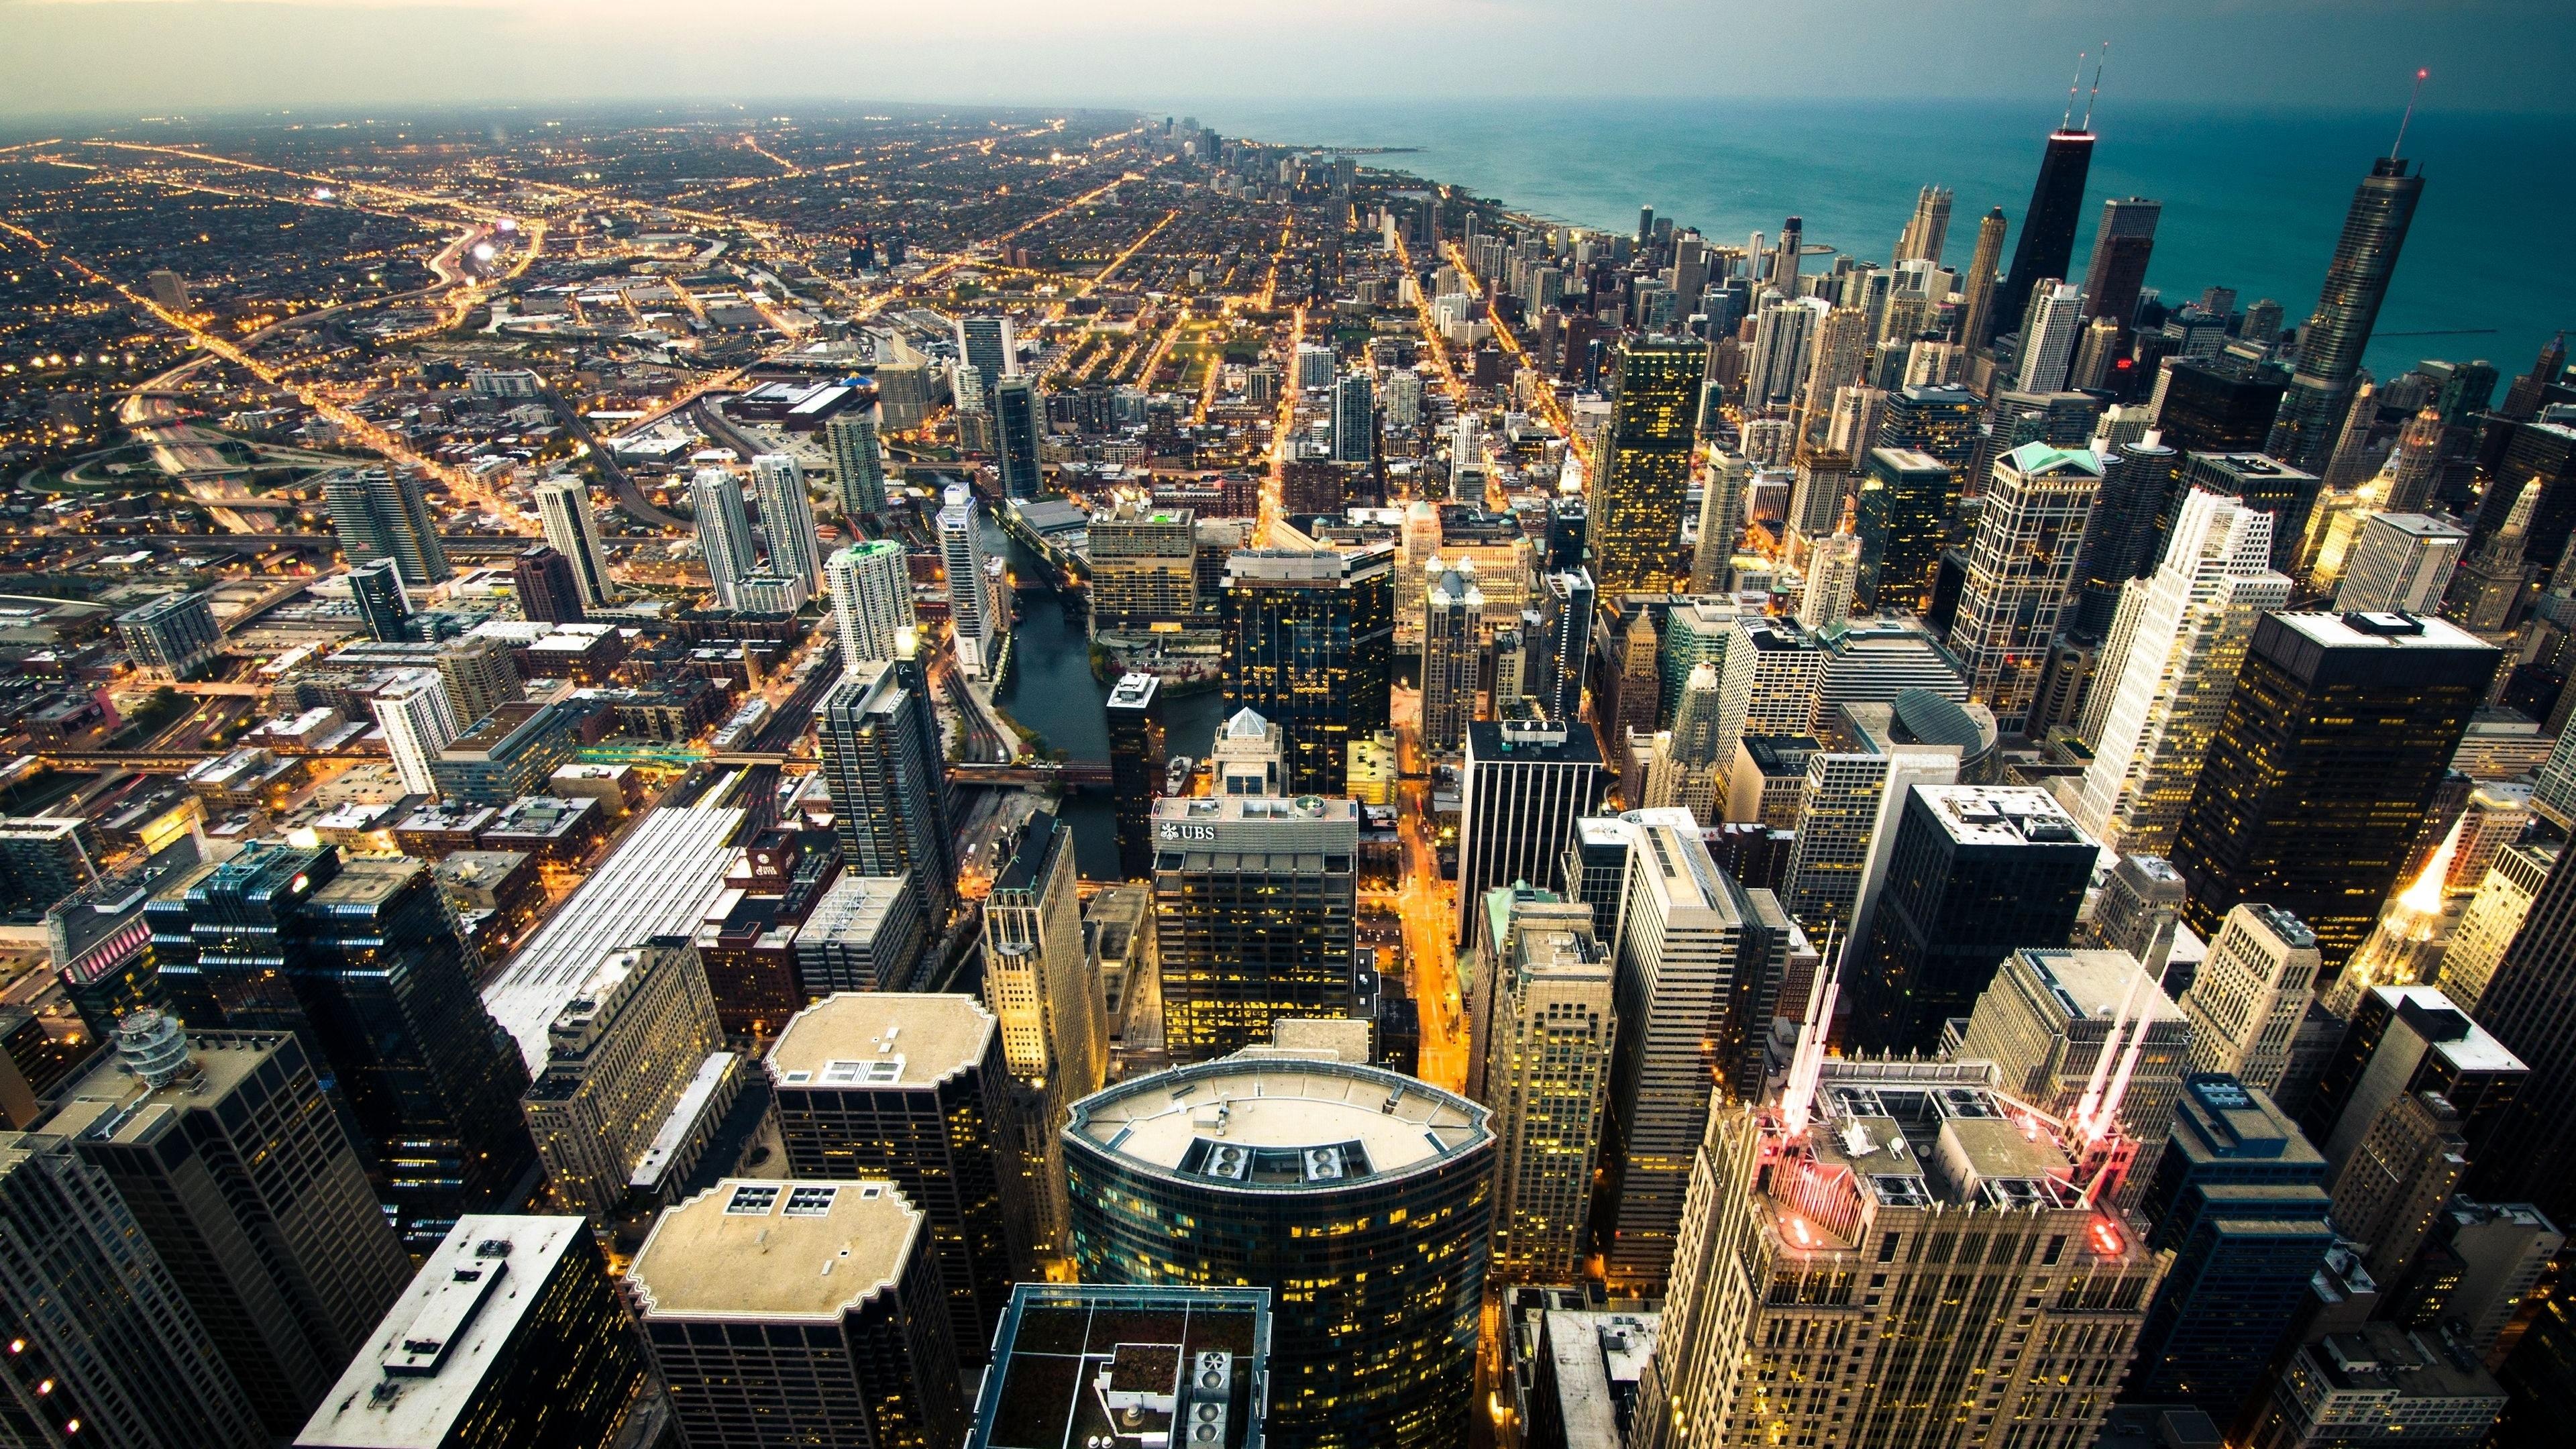 chicago skyline city lights coastline 4k 1538068197 - chicago, skyline, city lights, coastline 4k - Skyline, city lights, Chicago